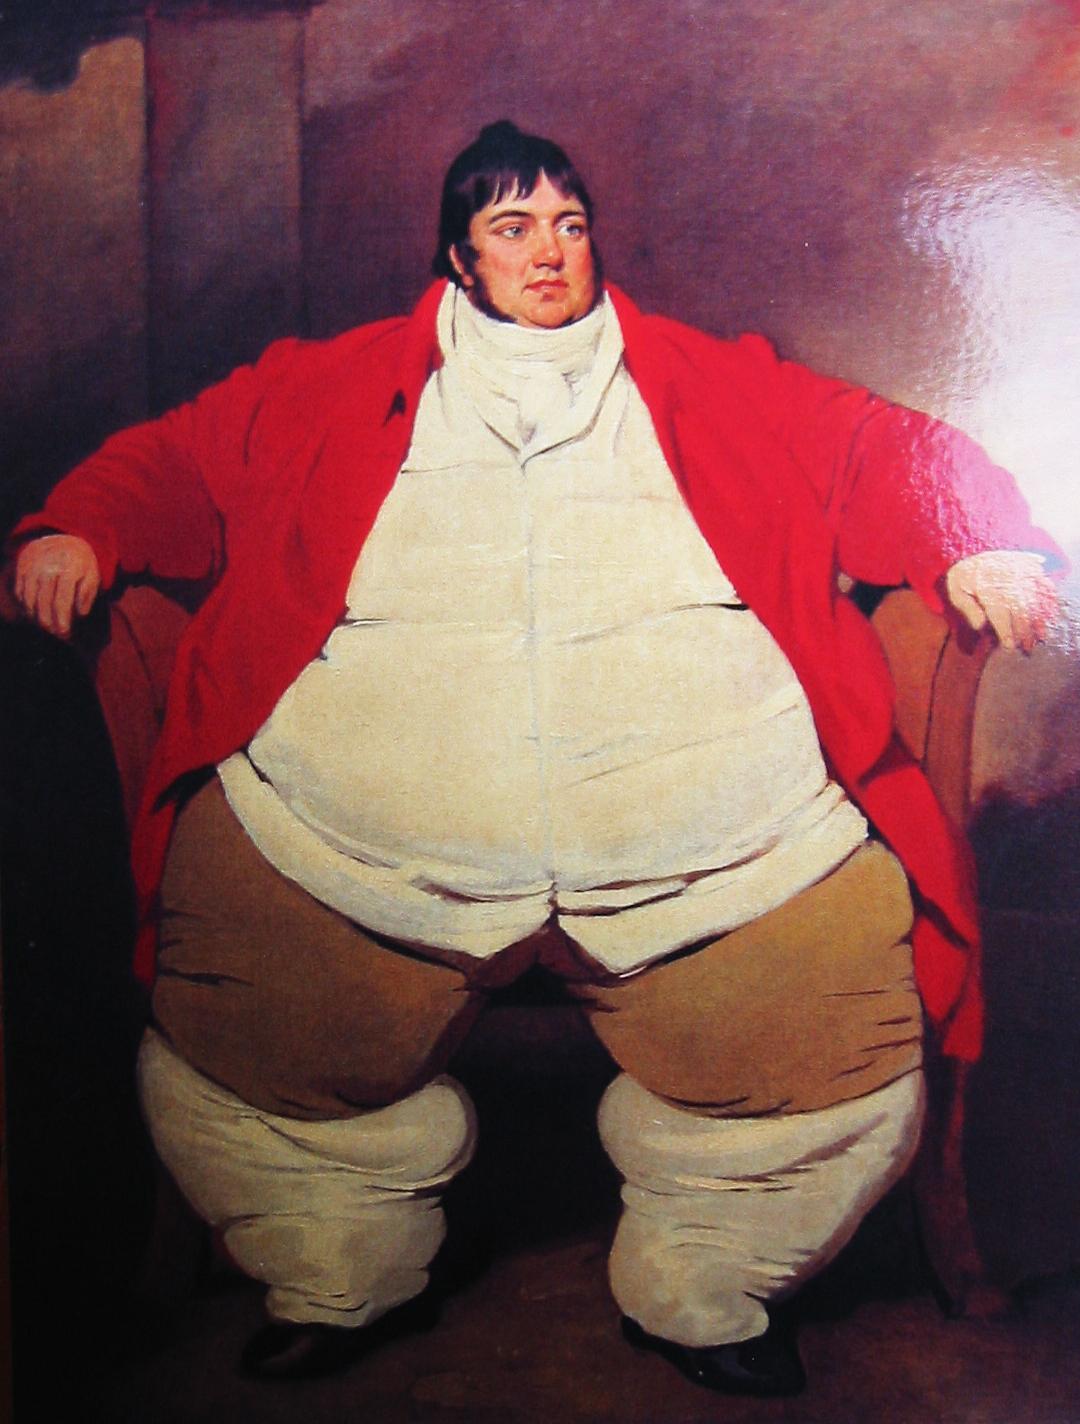 Como bajar de peso obesidad morbida